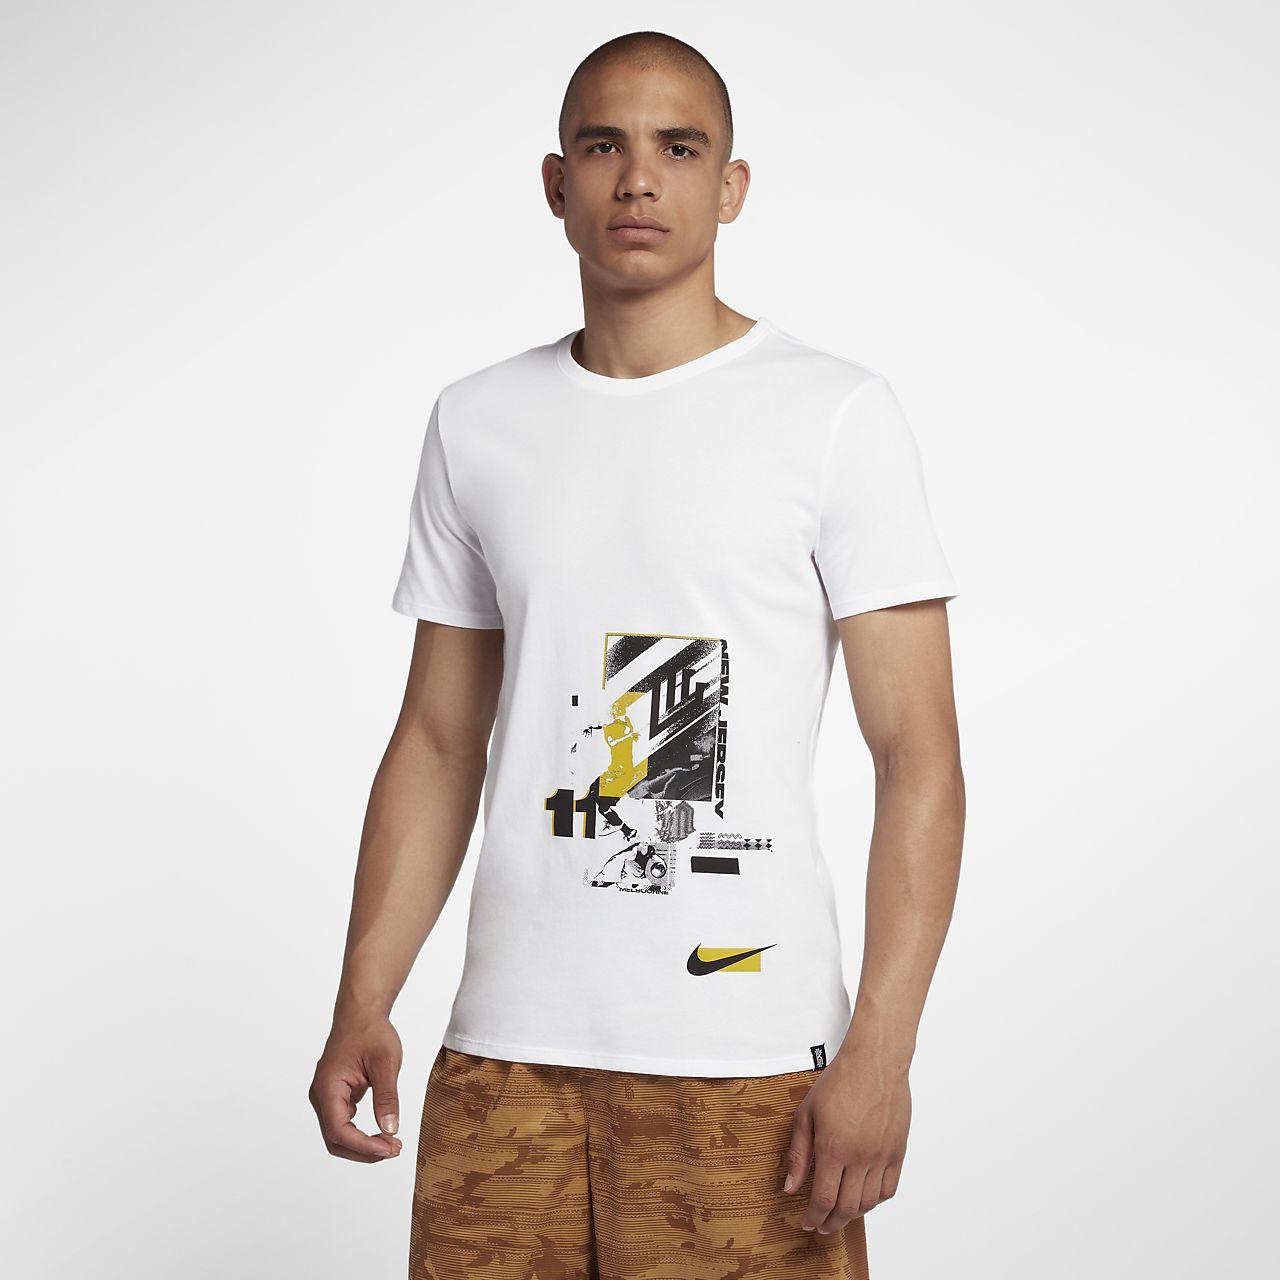 f58977a3 Kyrie Nike Dri-FIT Men's Basketball T-Shirt. Nike.com LU